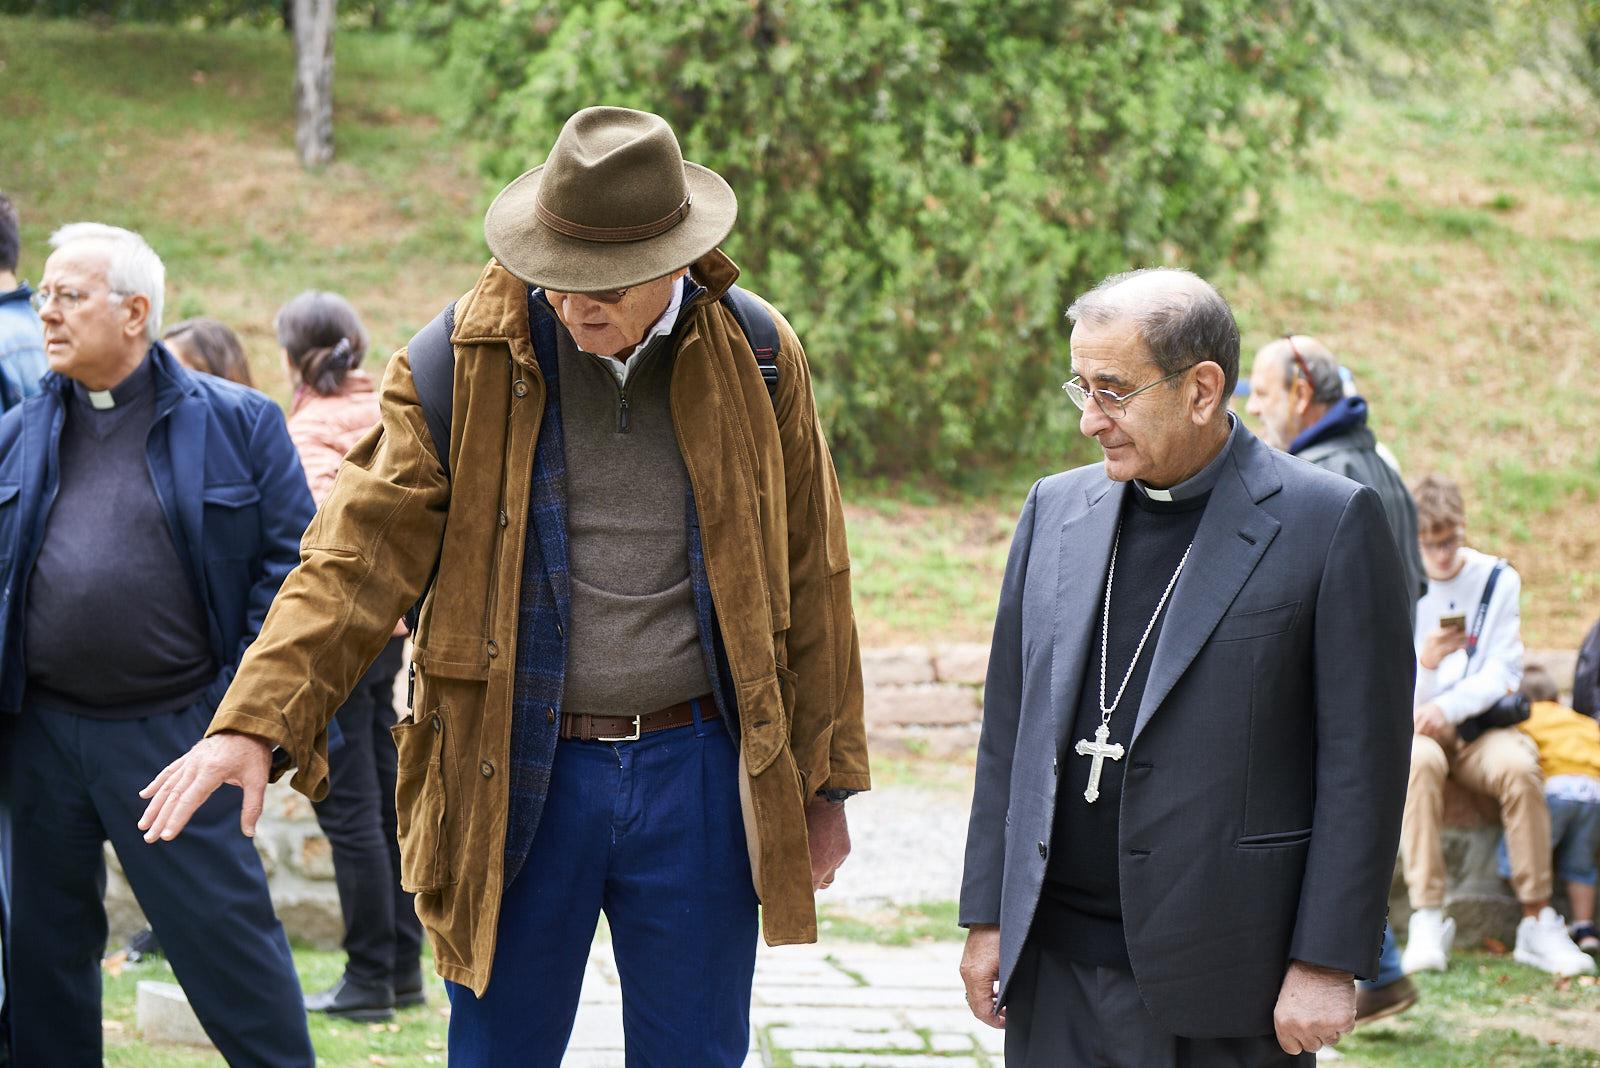 Delpini, arcivescovo di Milano, insieme a Gabriele Nissim, presidente di Gariwo